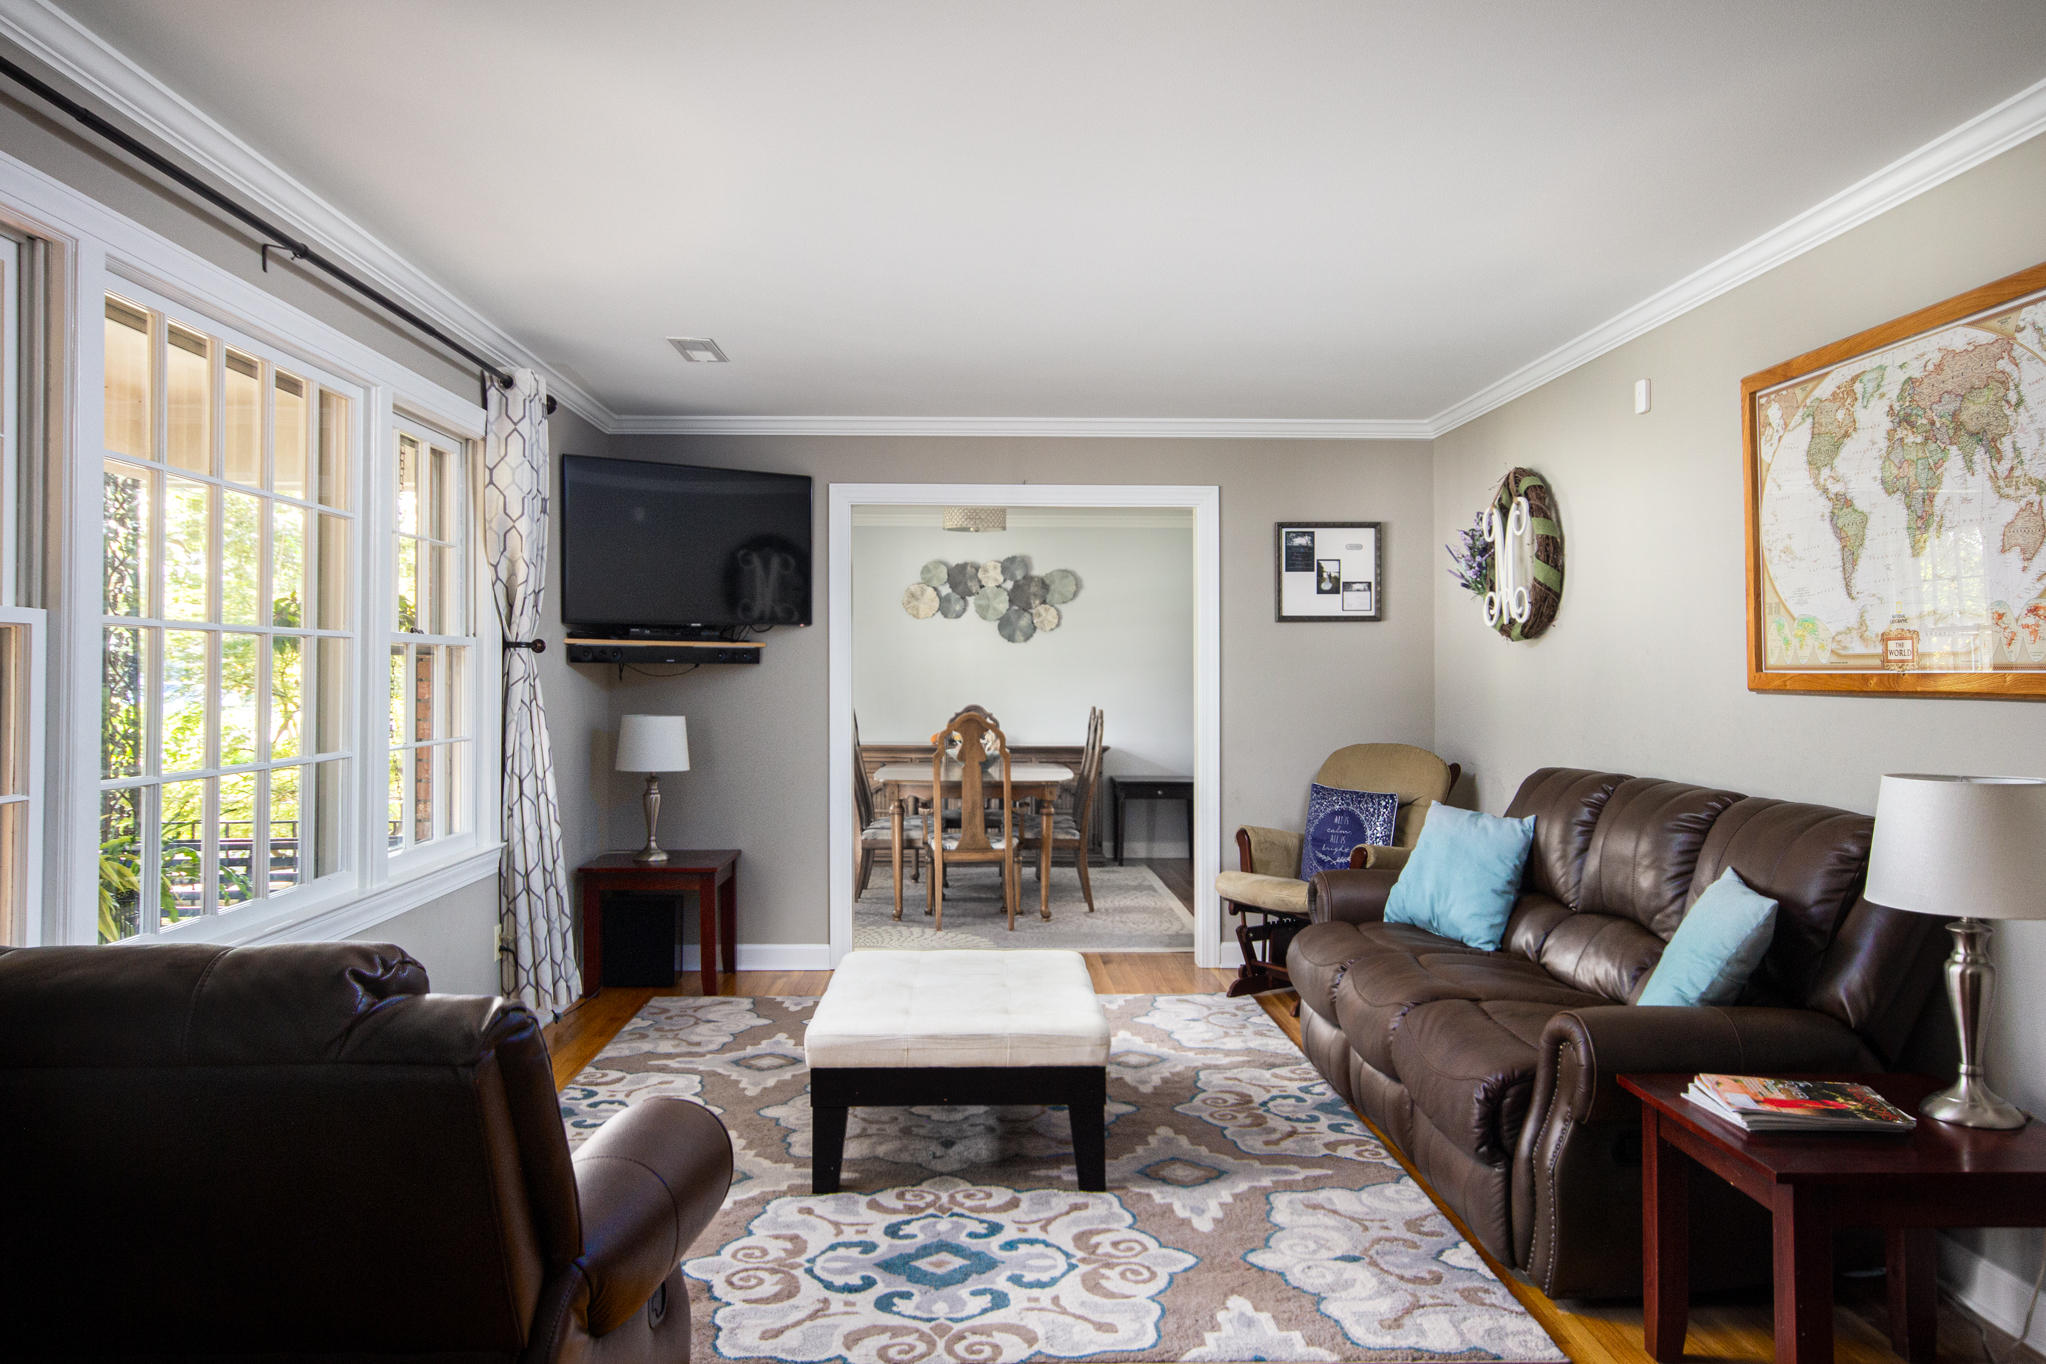 Belvedere Estates Homes For Sale - 6021 Rembert, Hanahan, SC - 12